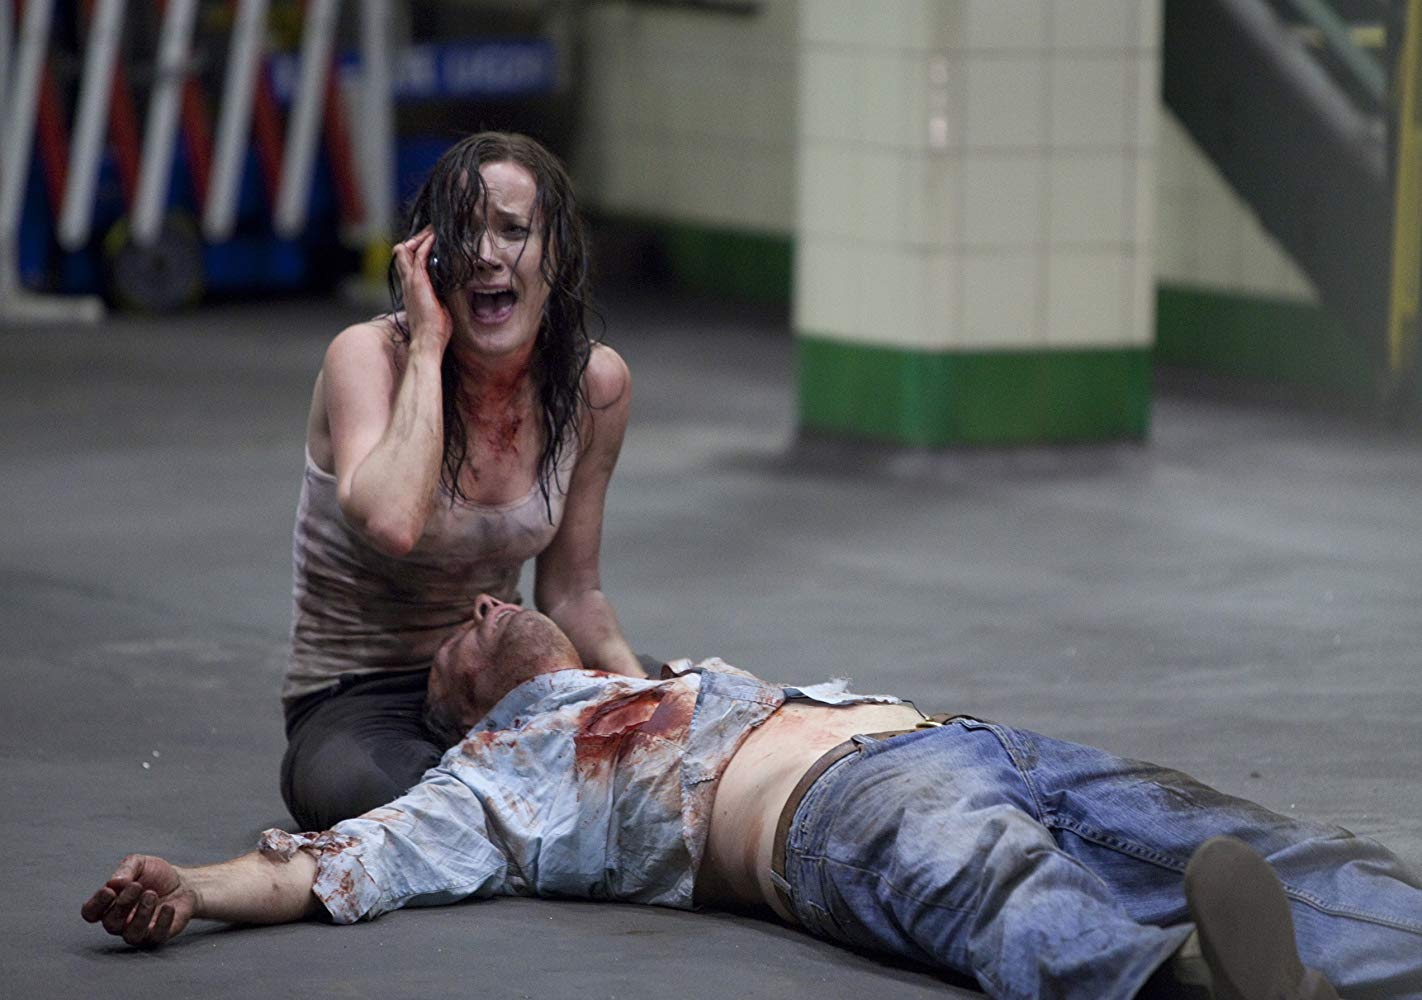 TV reporter Natasha Warner (Bel Delia) with cameraman Steve Davis (lying on ground) in The Tunnel (2011)